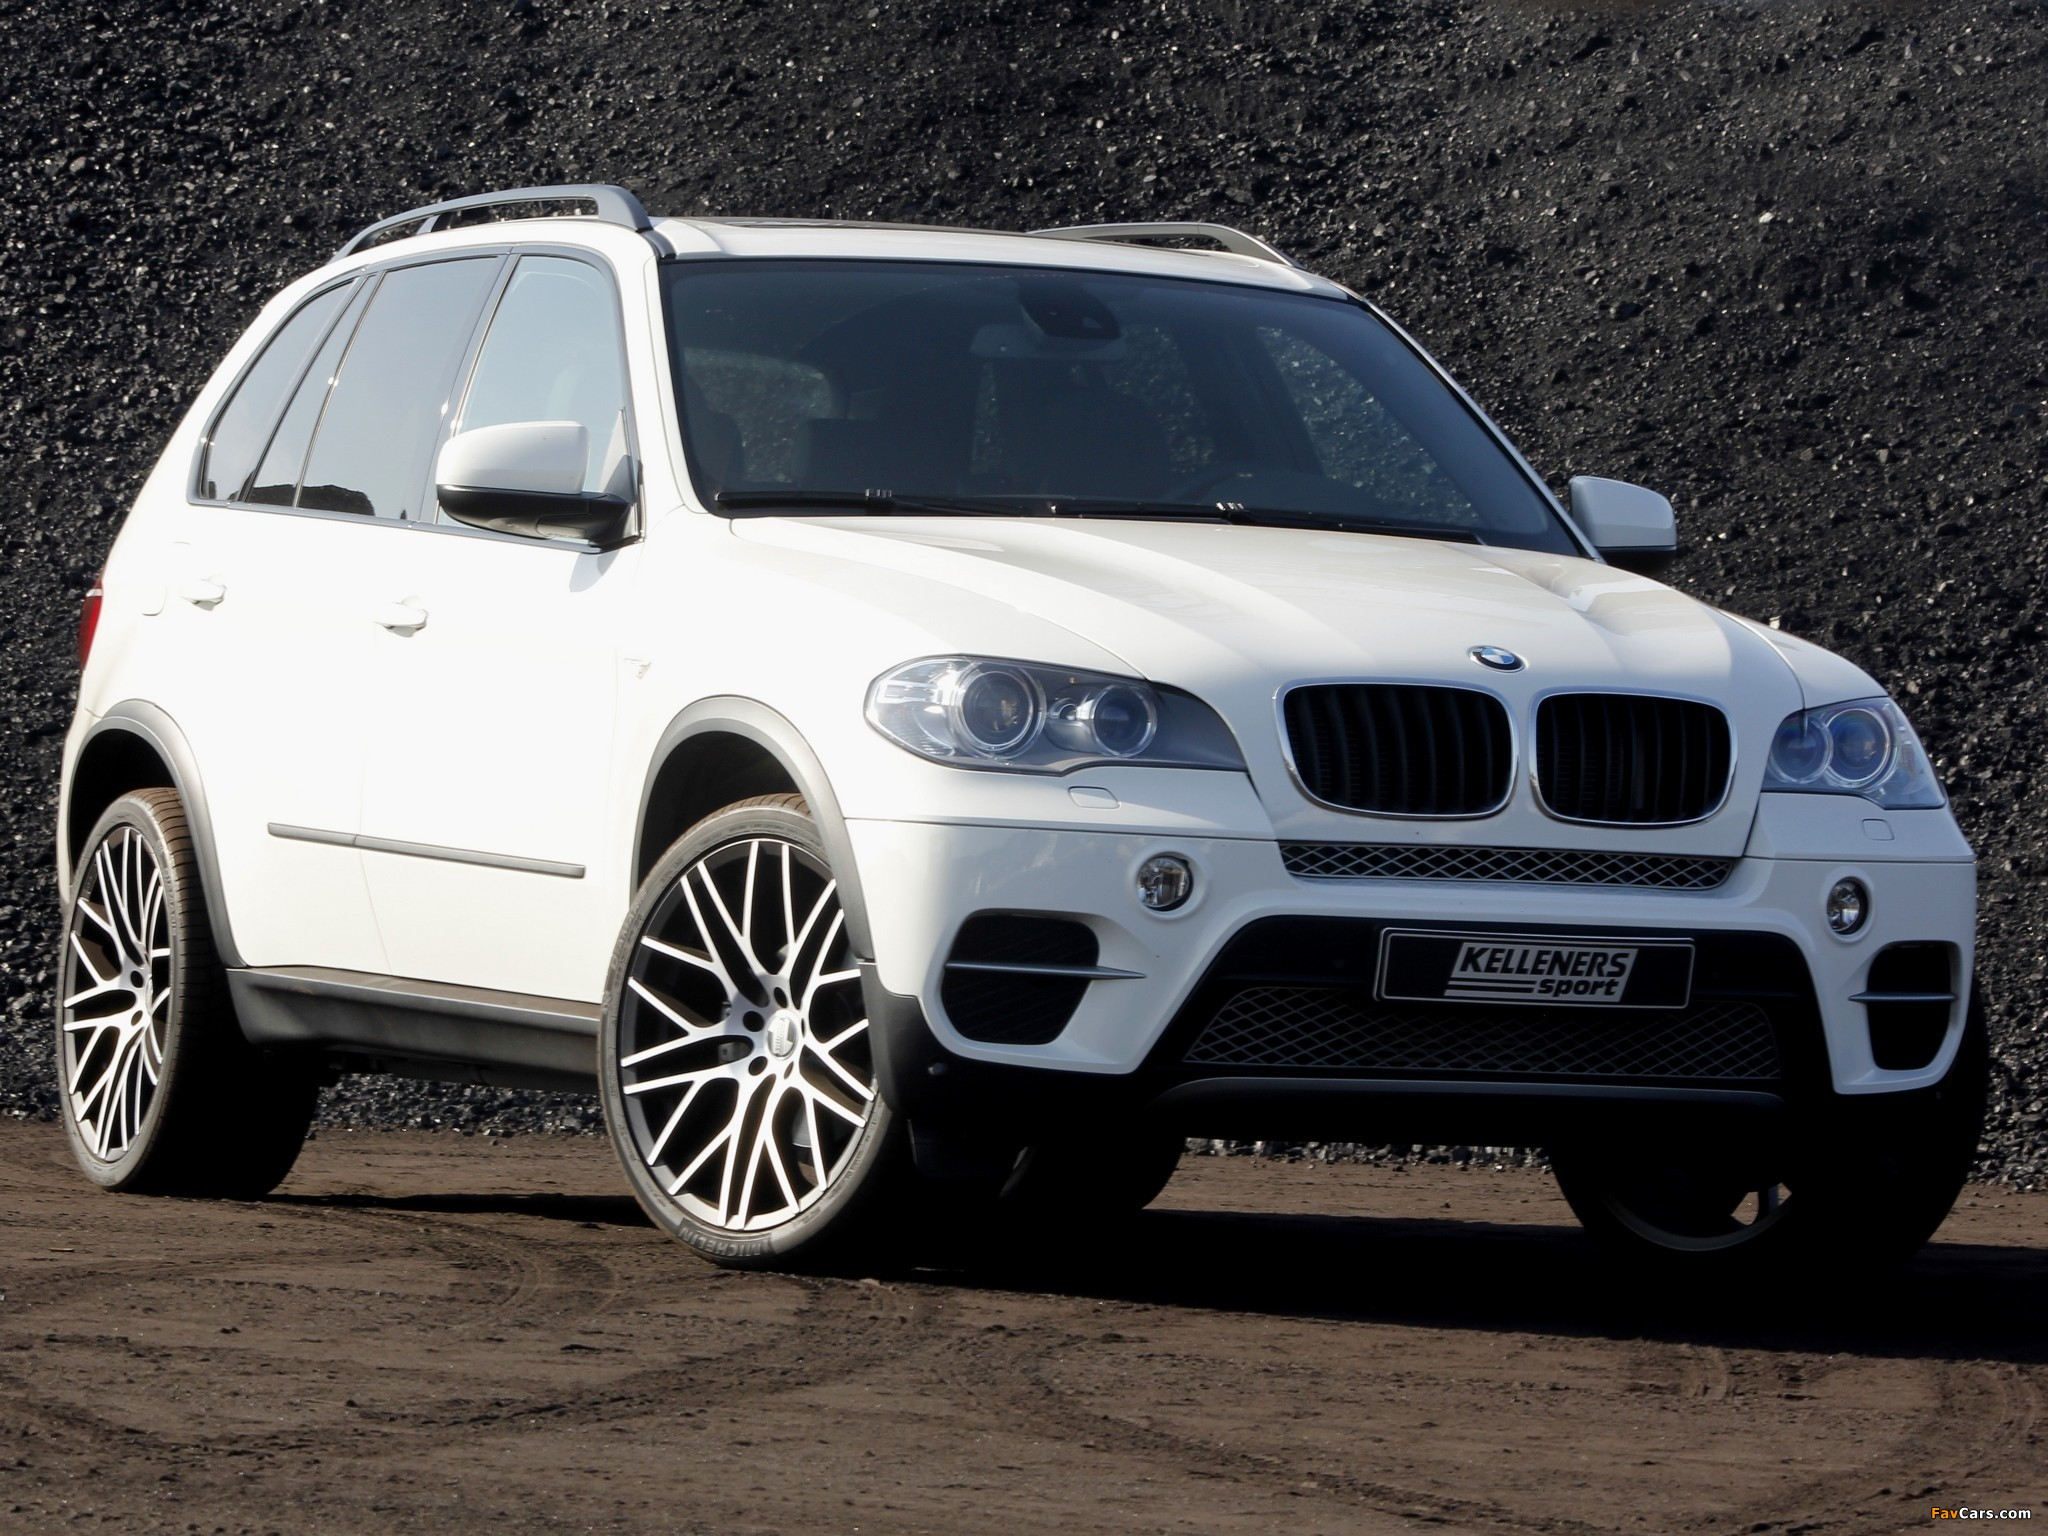 Images of Kelleners Sport BMW X5 (E70) 2012 (2048x1536)